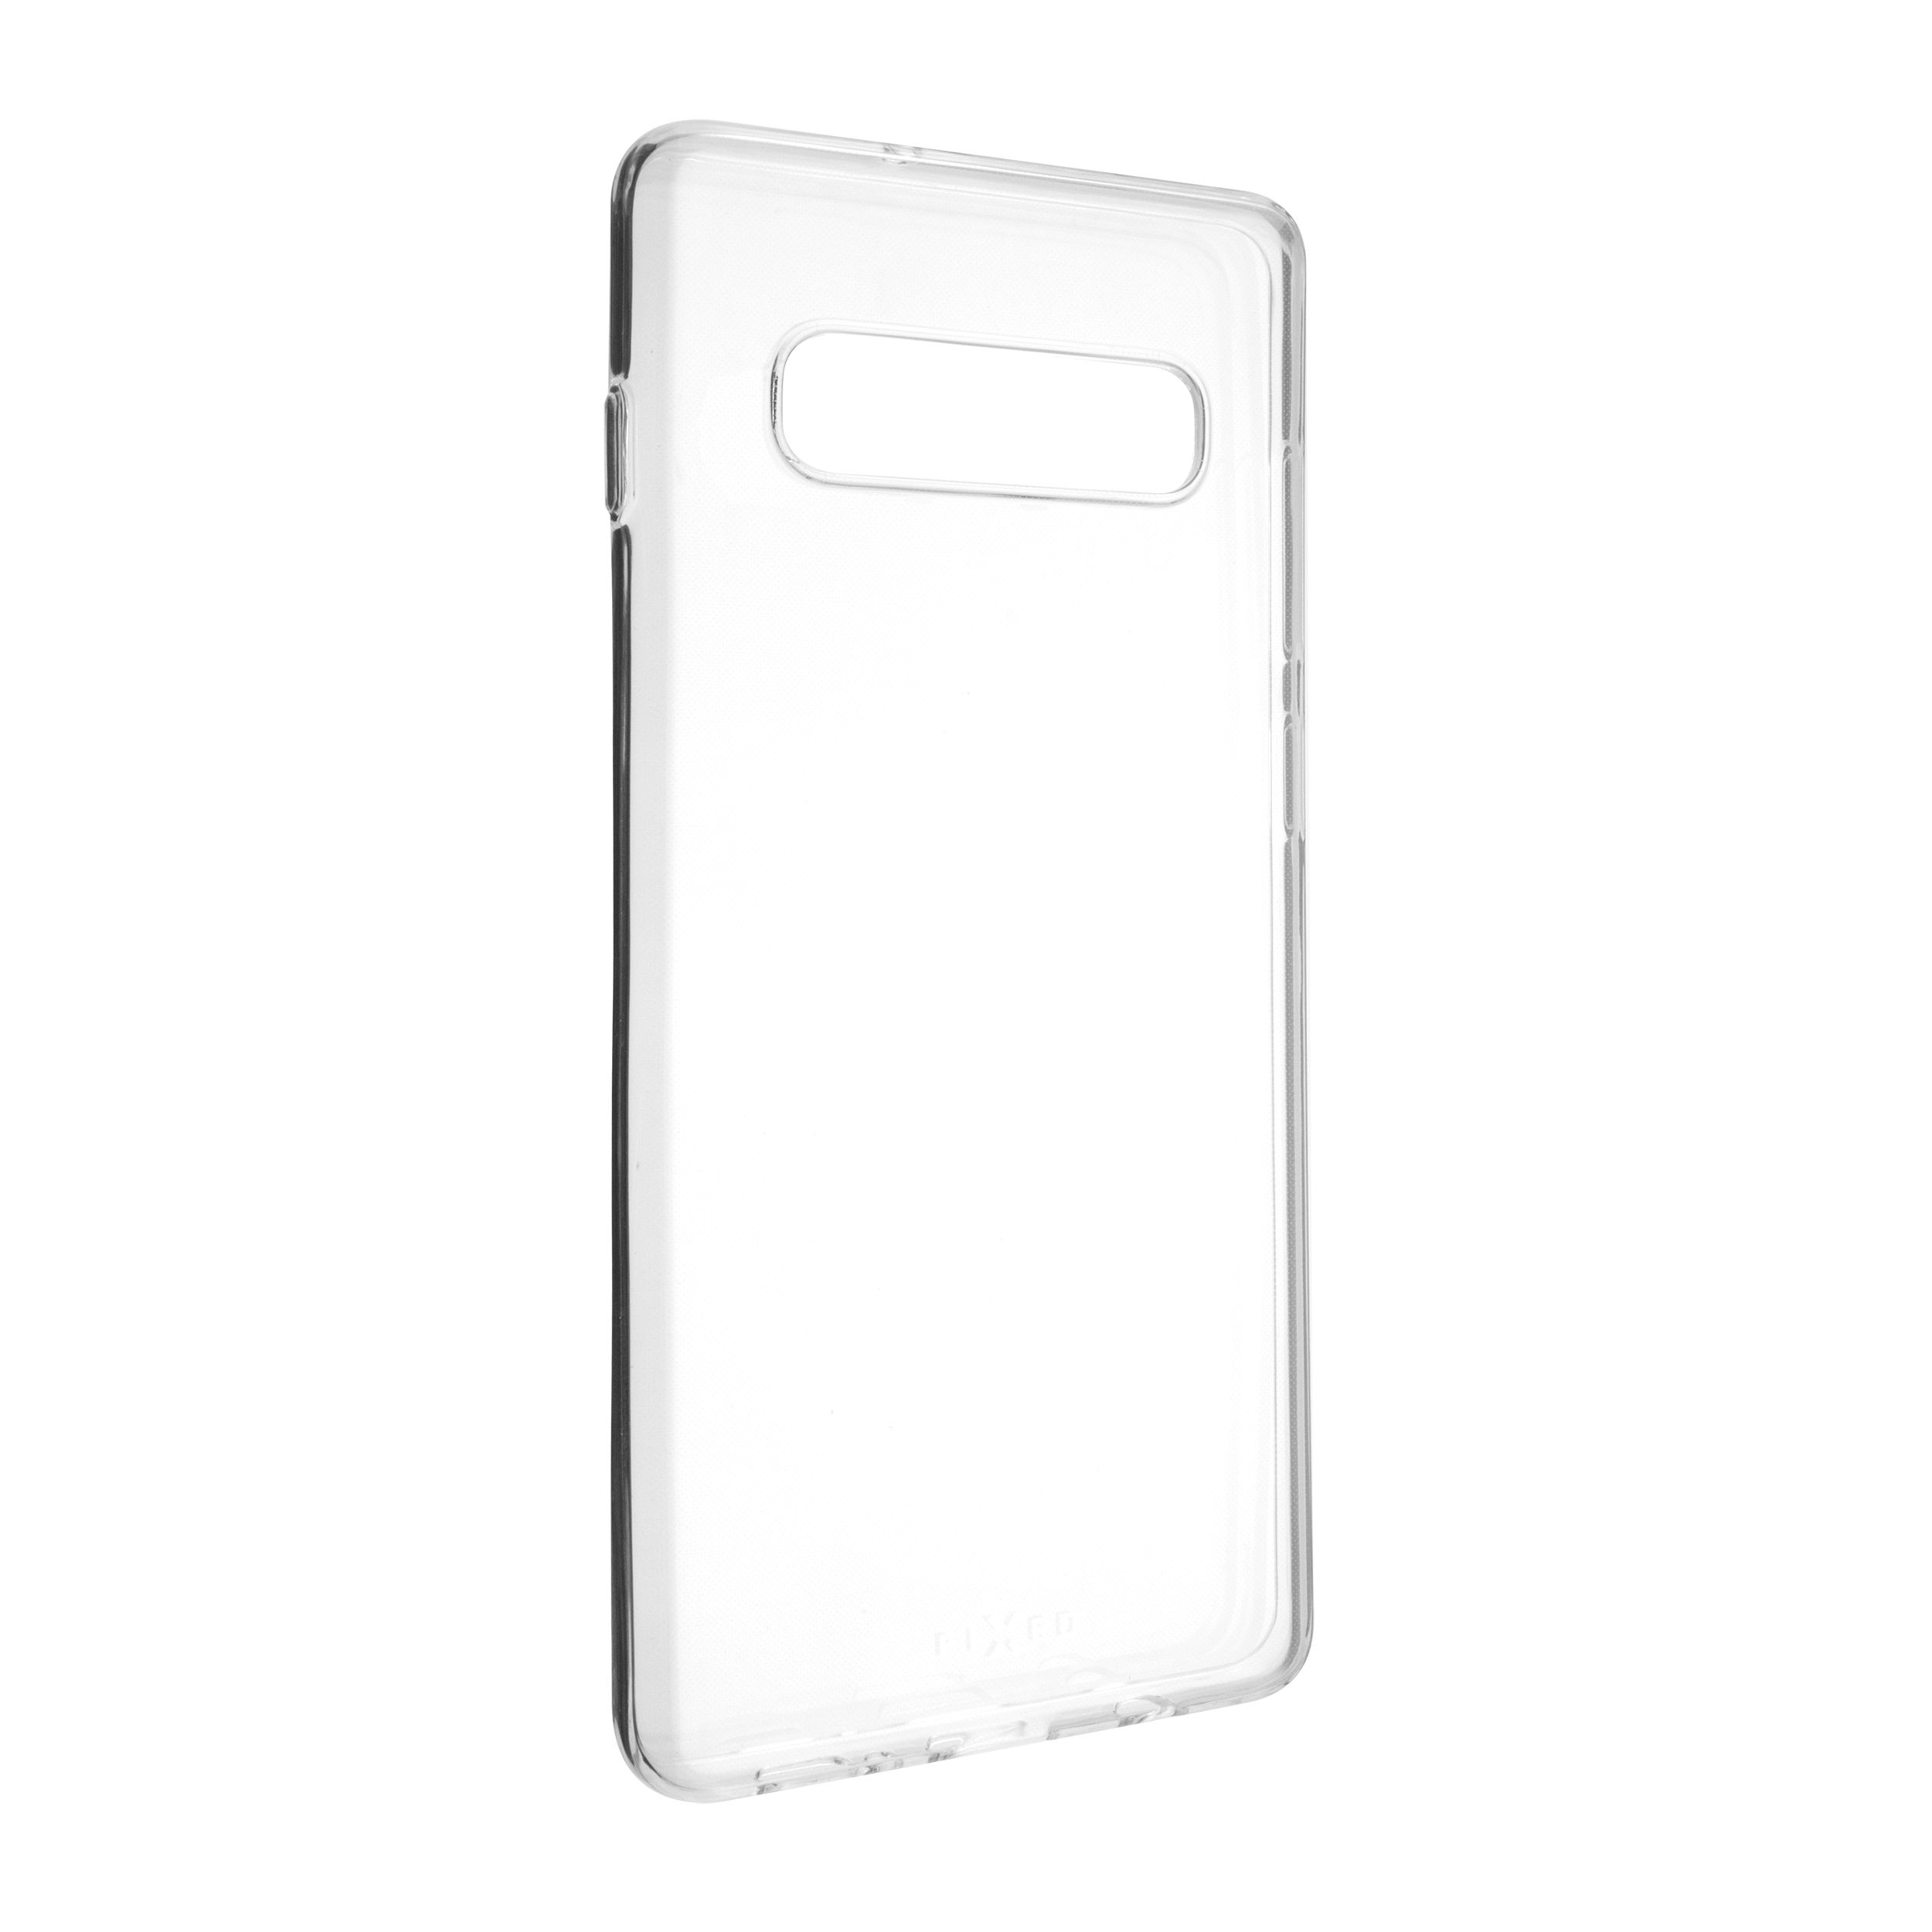 Ultratenké TPU gelové pouzdro FIXED Skin pro Samsung Galaxy S10+, 0,6 mm, čiré